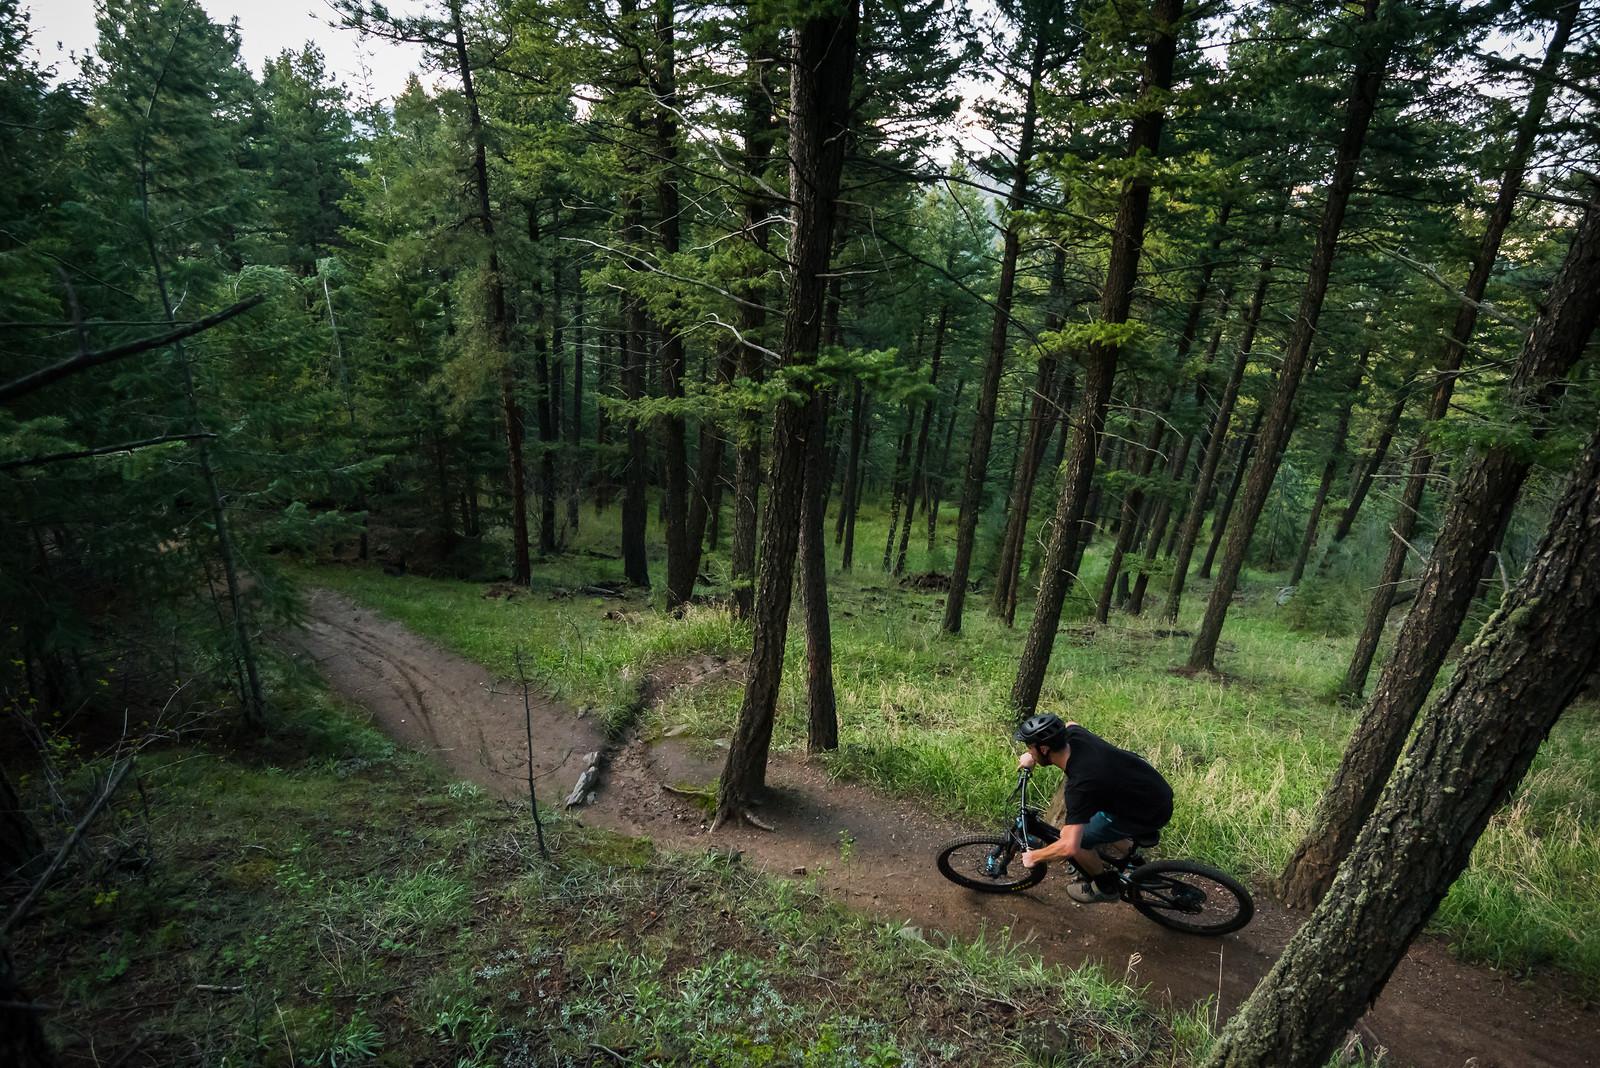 PJR-2 - russellpj - Mountain Biking Pictures - Vital MTB